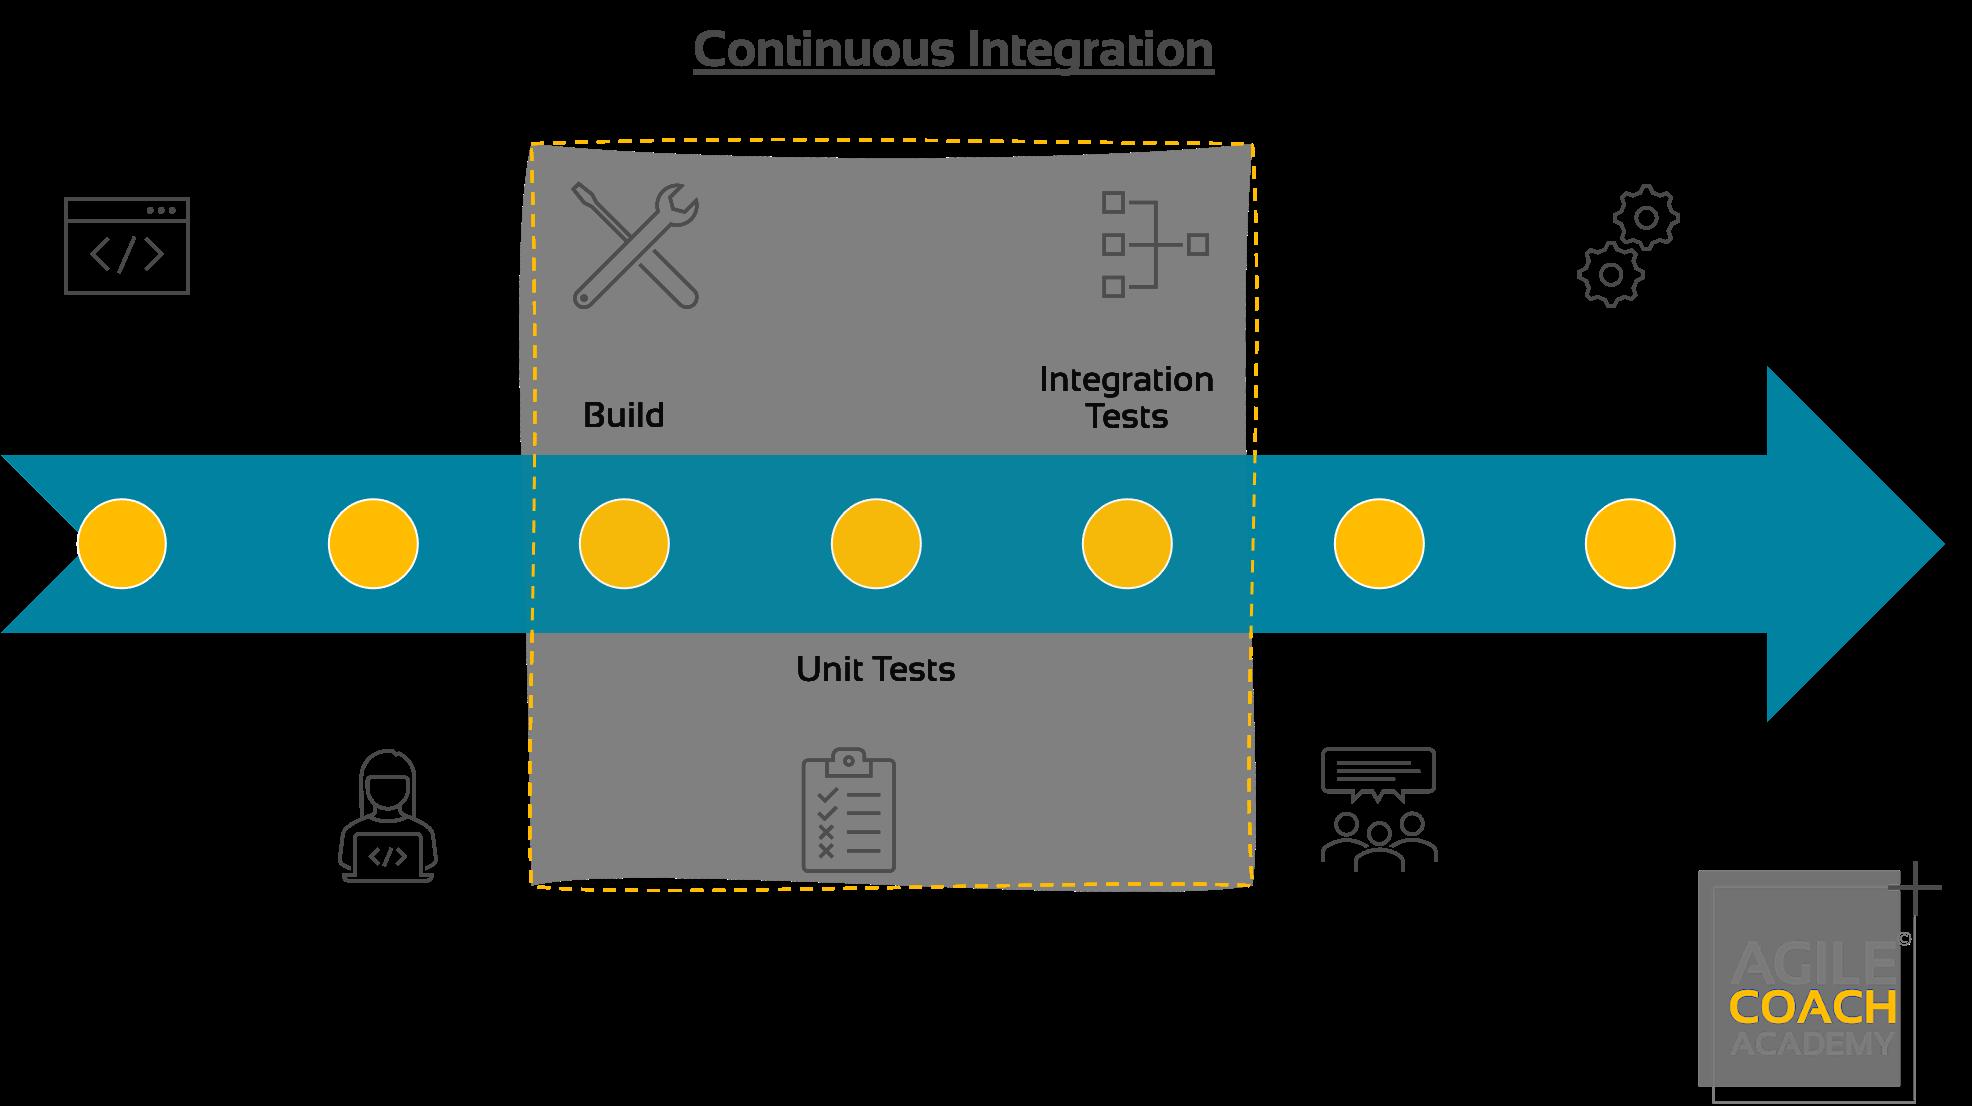 Continuous Integration Pipeline